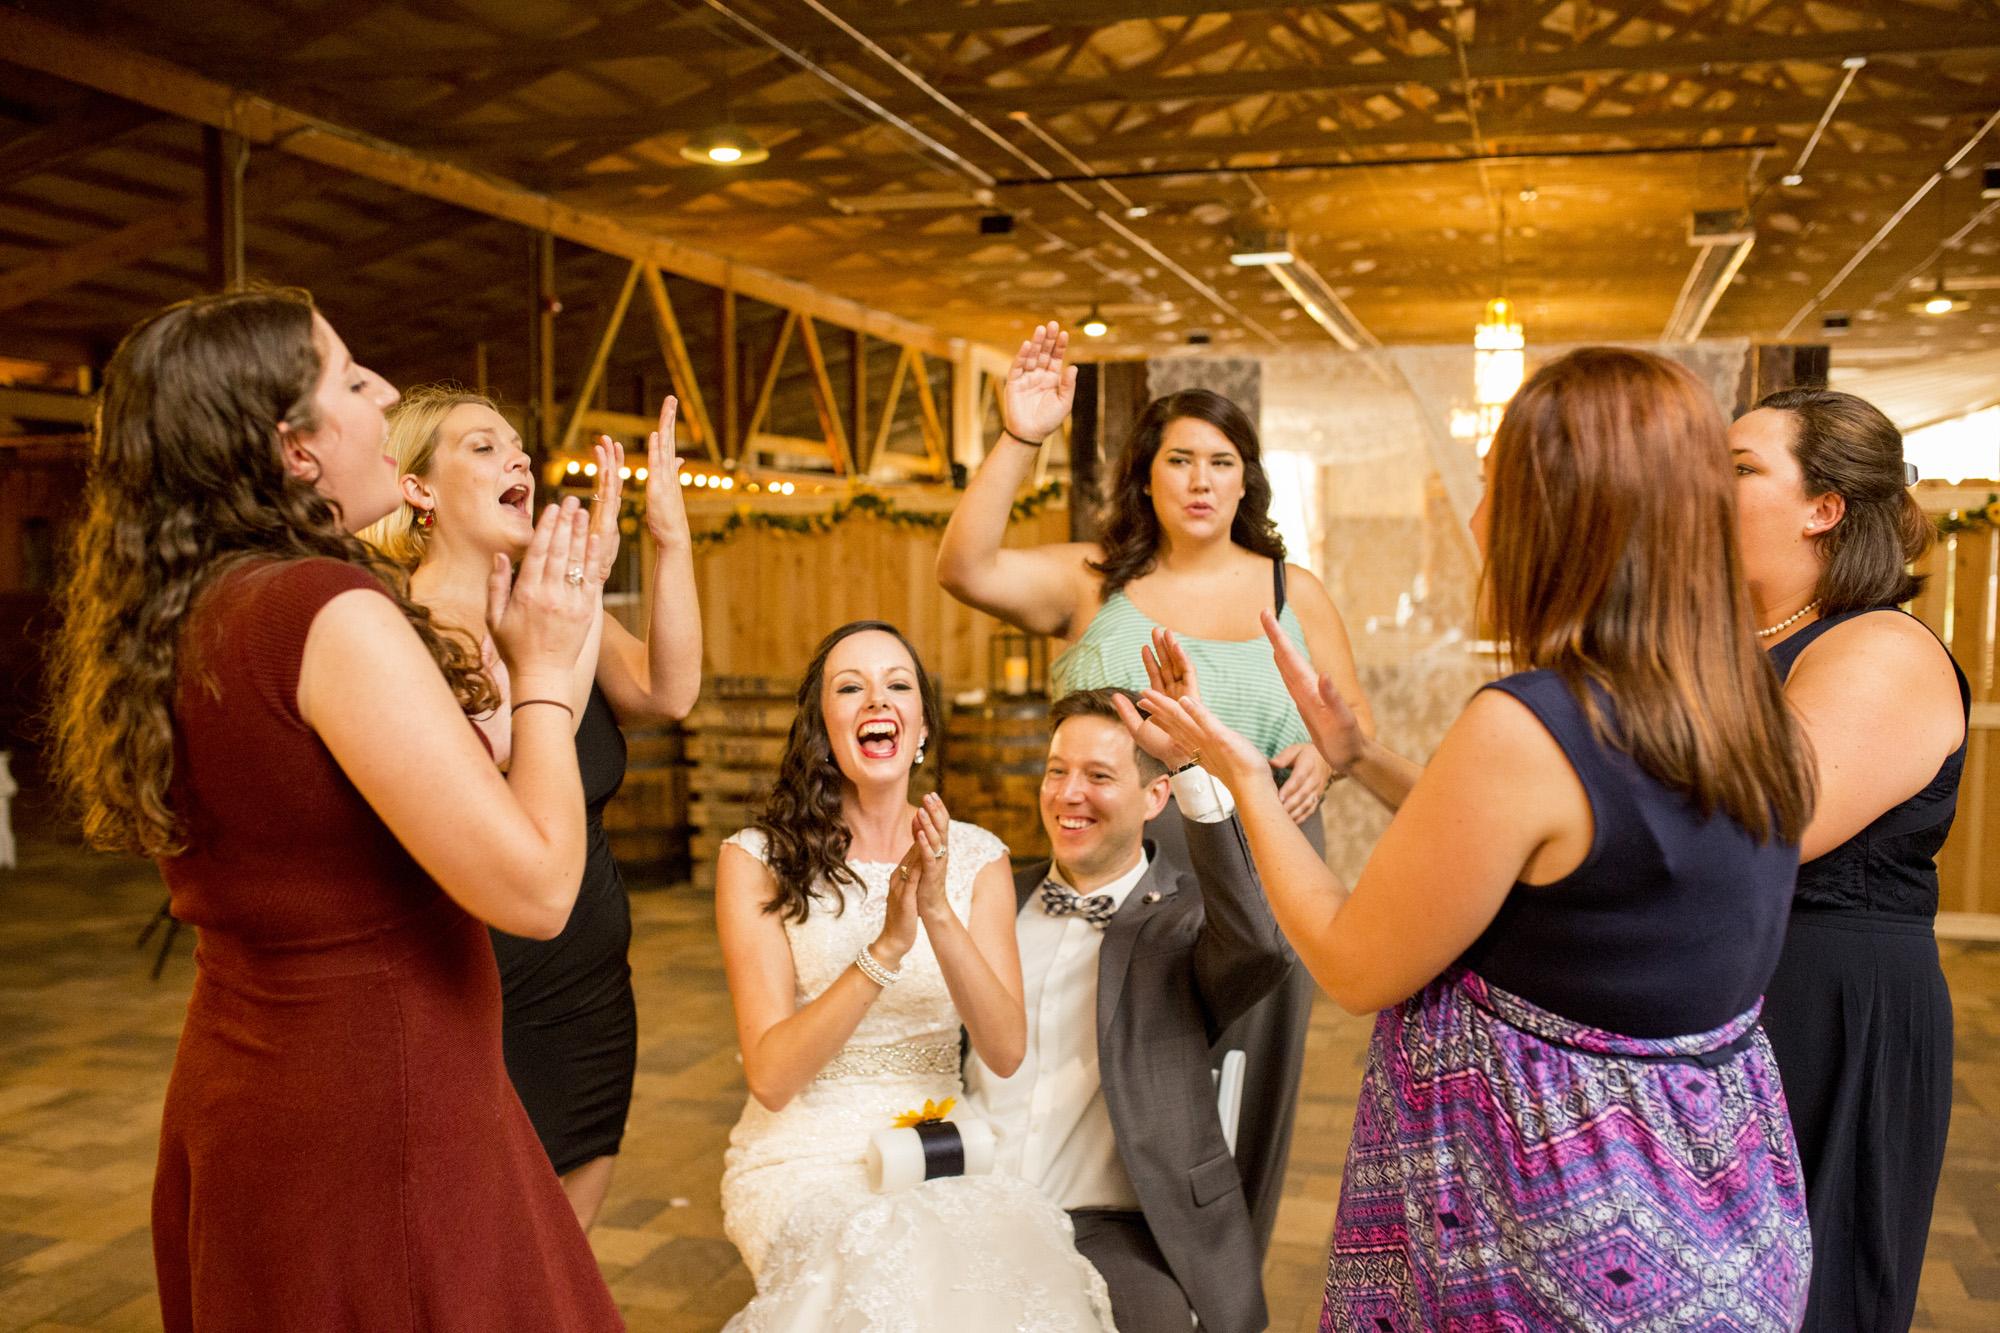 Seriously_Sabrina_Photography_Bowling_Green_Kentucky_Highland_Stables_Wedding_Wolff132.jpg